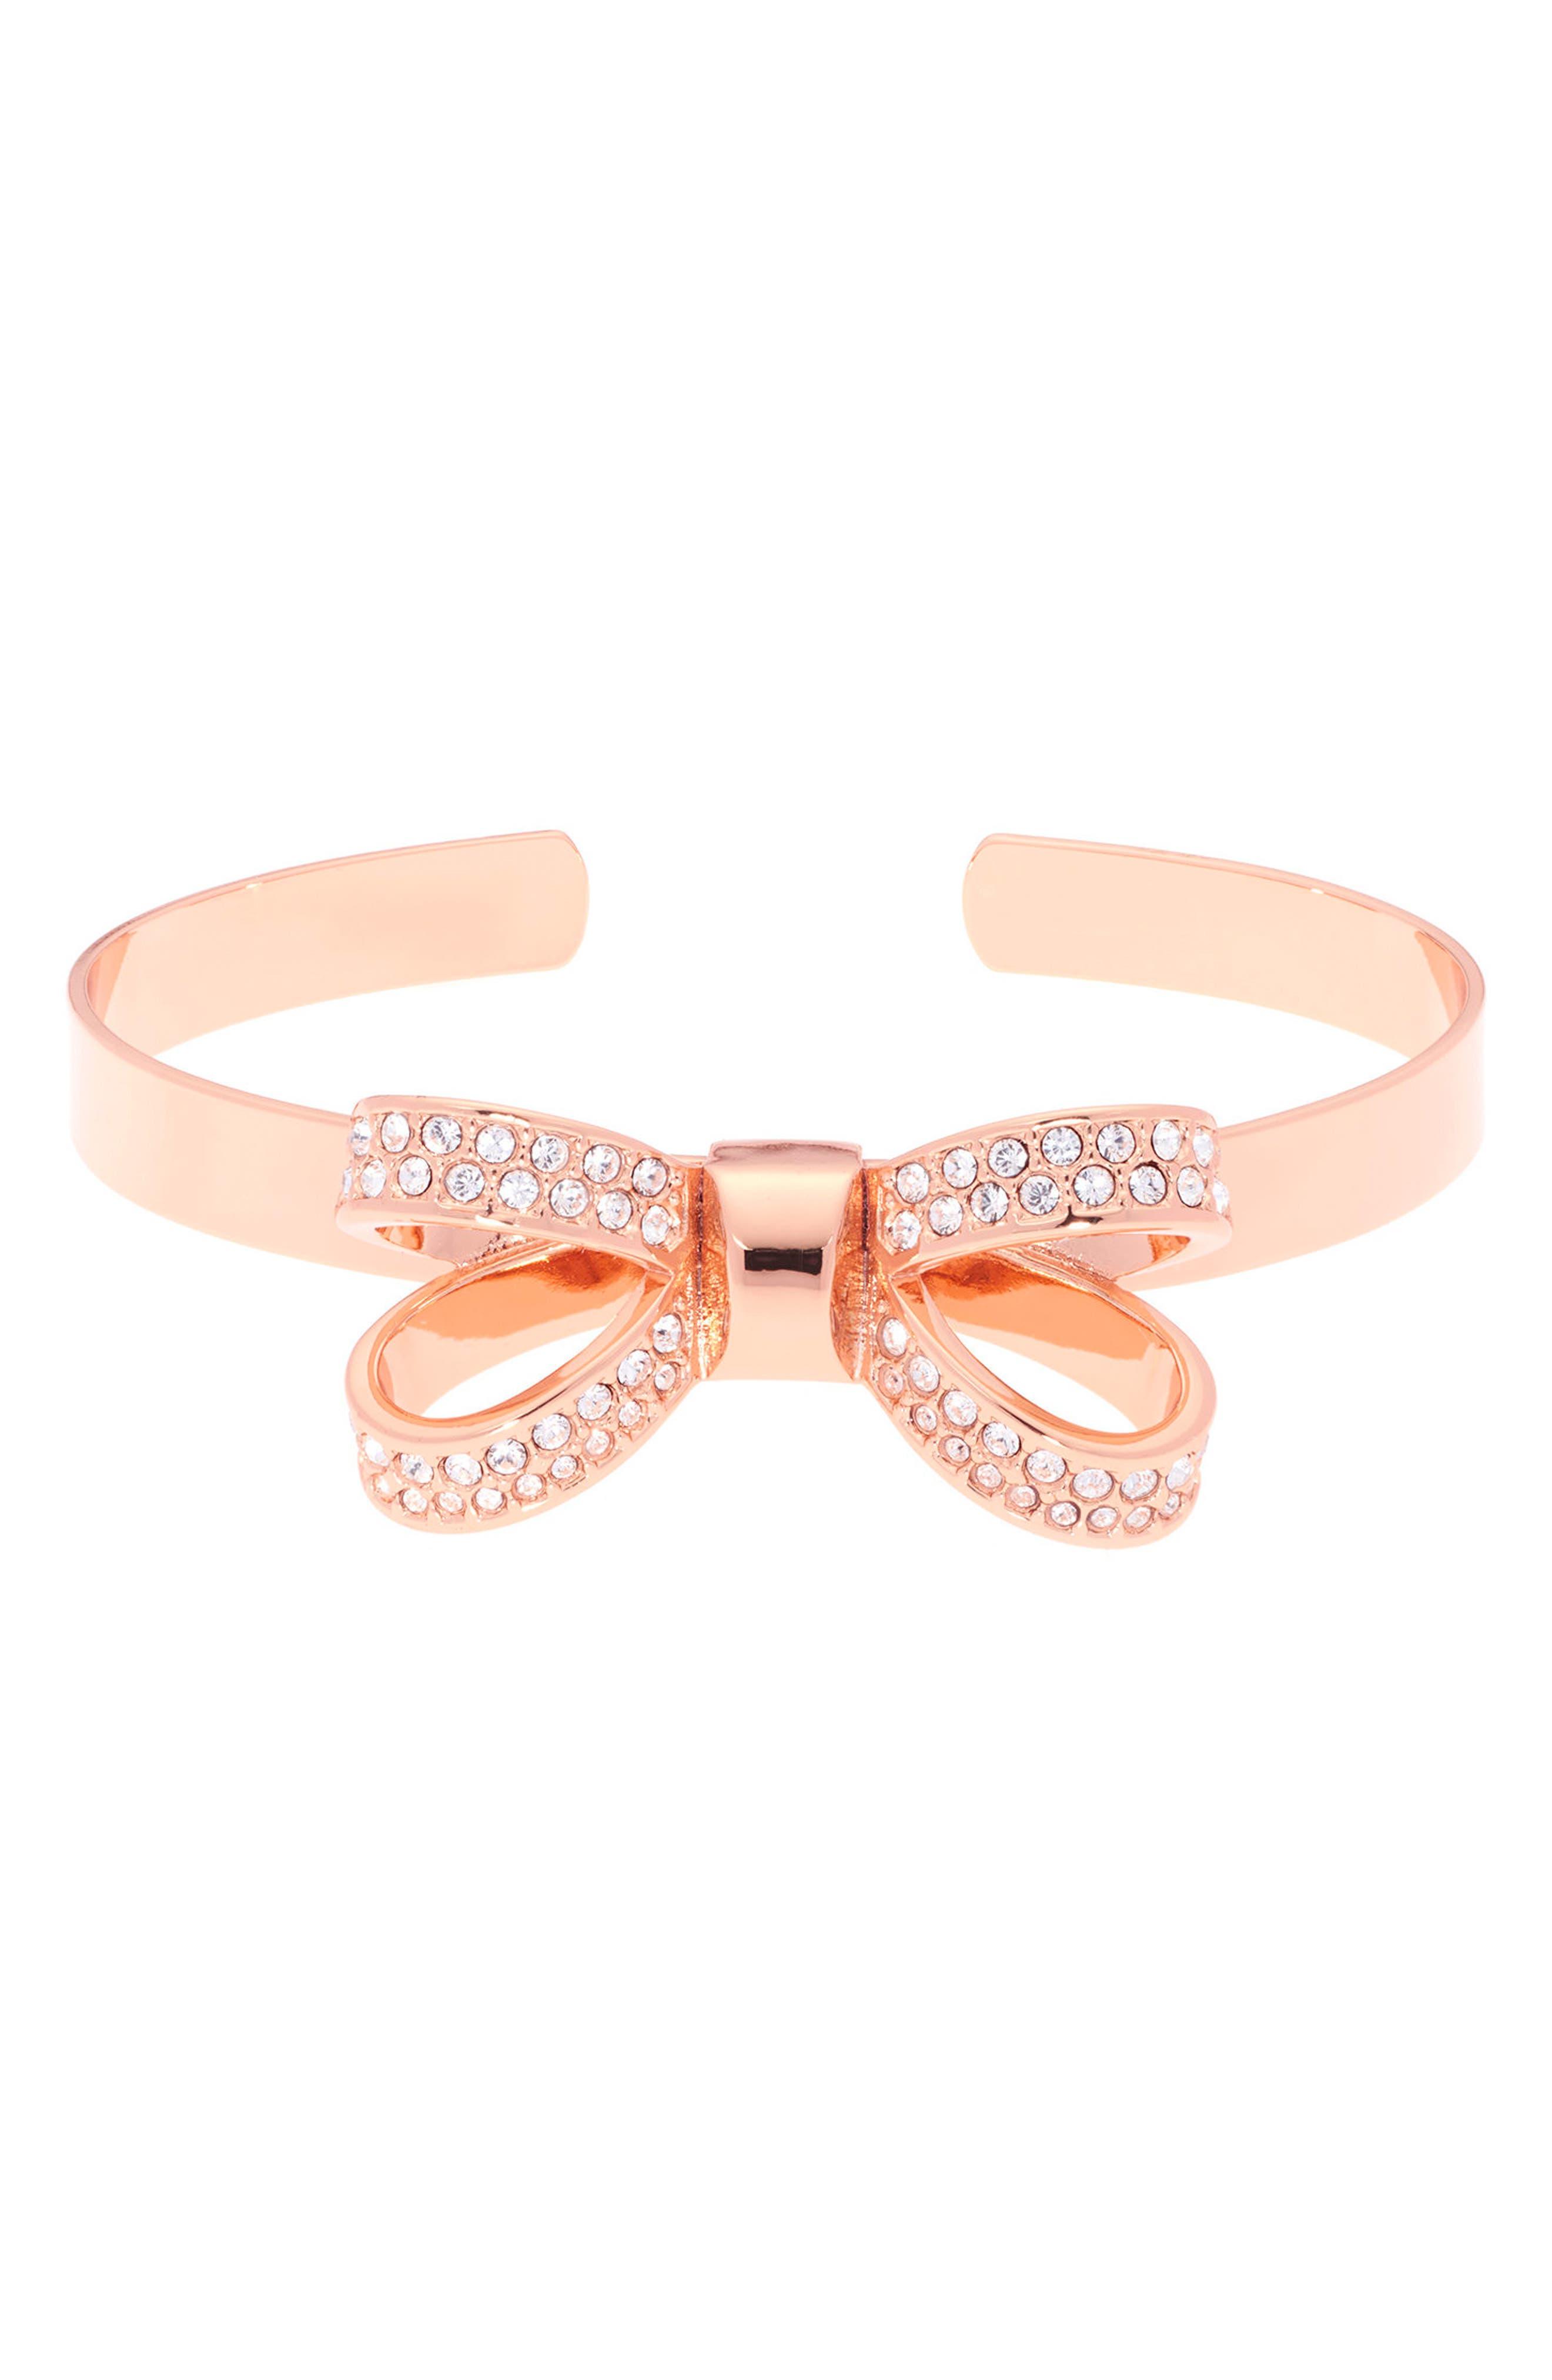 Alternate Image 1 Selected - Ted Baker London Opulent Pavé Bow Cuff Bracelet